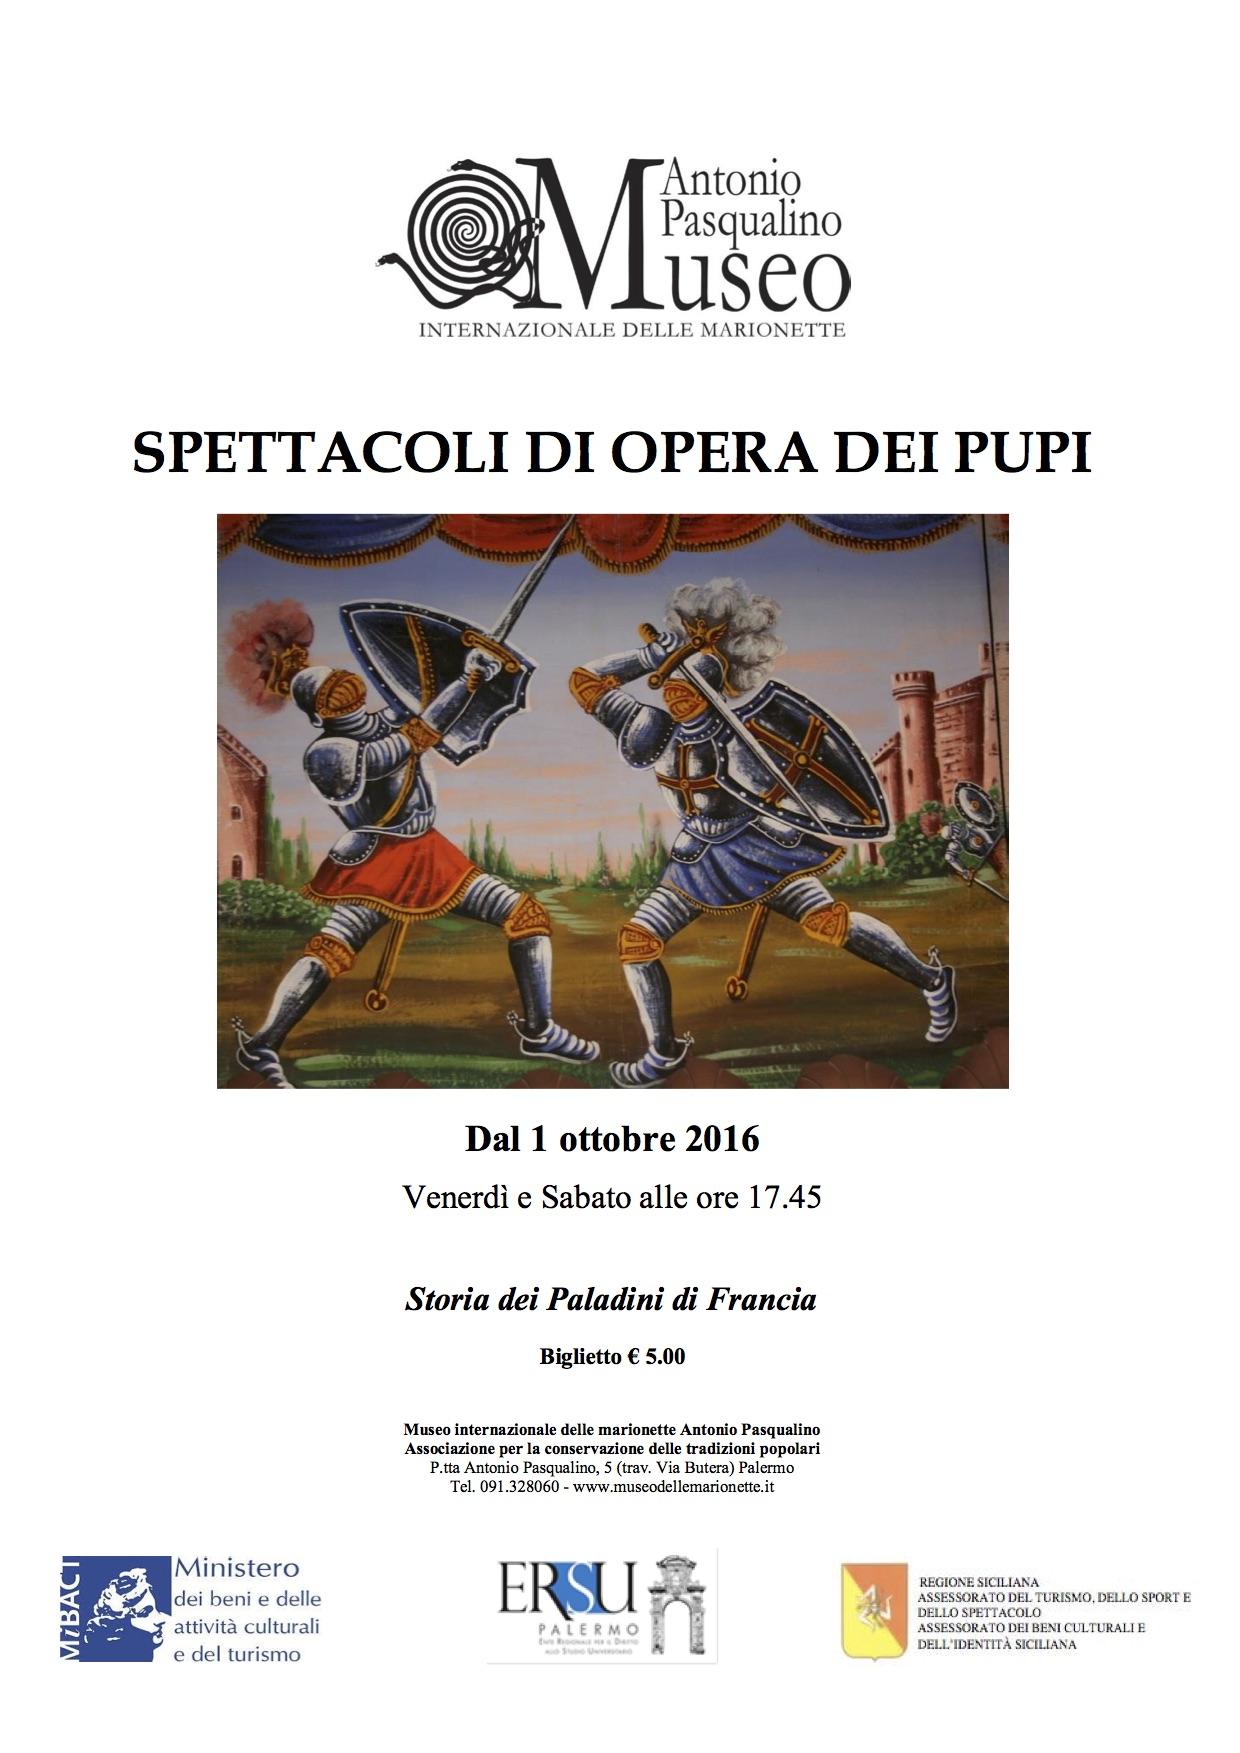 Spettacoli_Opera_dei_pupi_Ott_2016.jpg - 313.56 kB